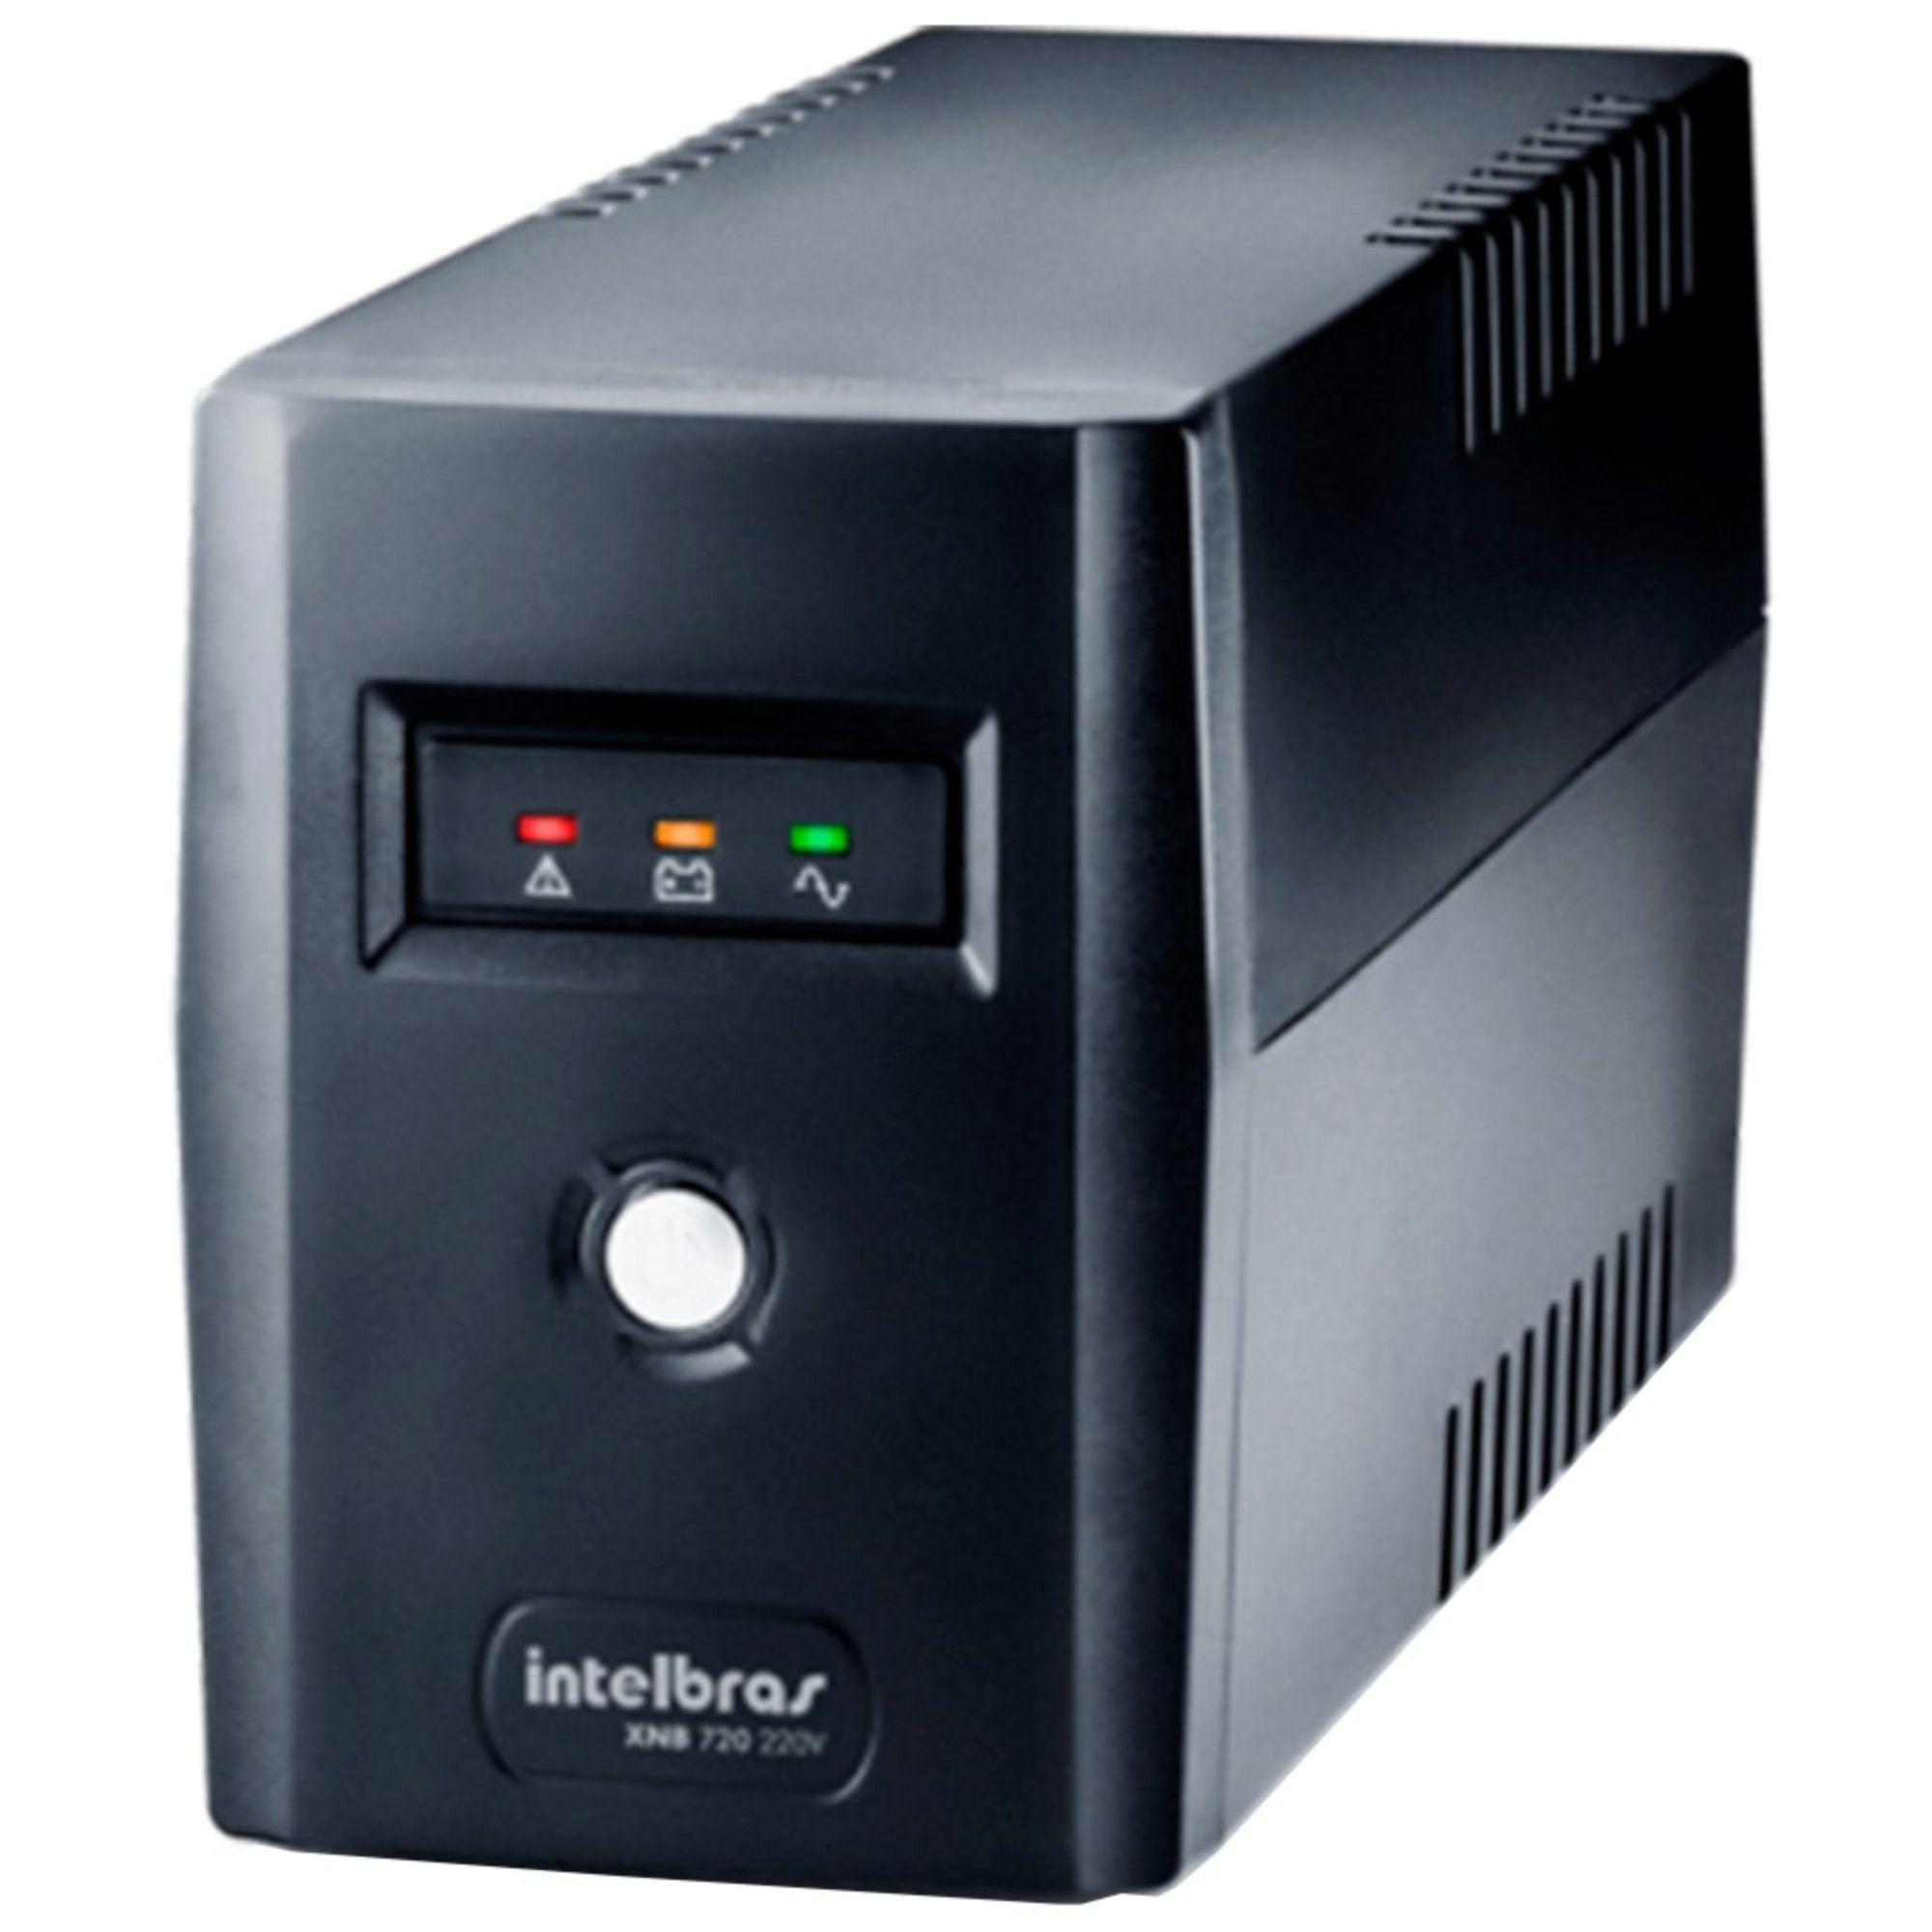 Nobreak Intelbras 720va Xnb 700va 110v Pc Xbox Drv Câmera